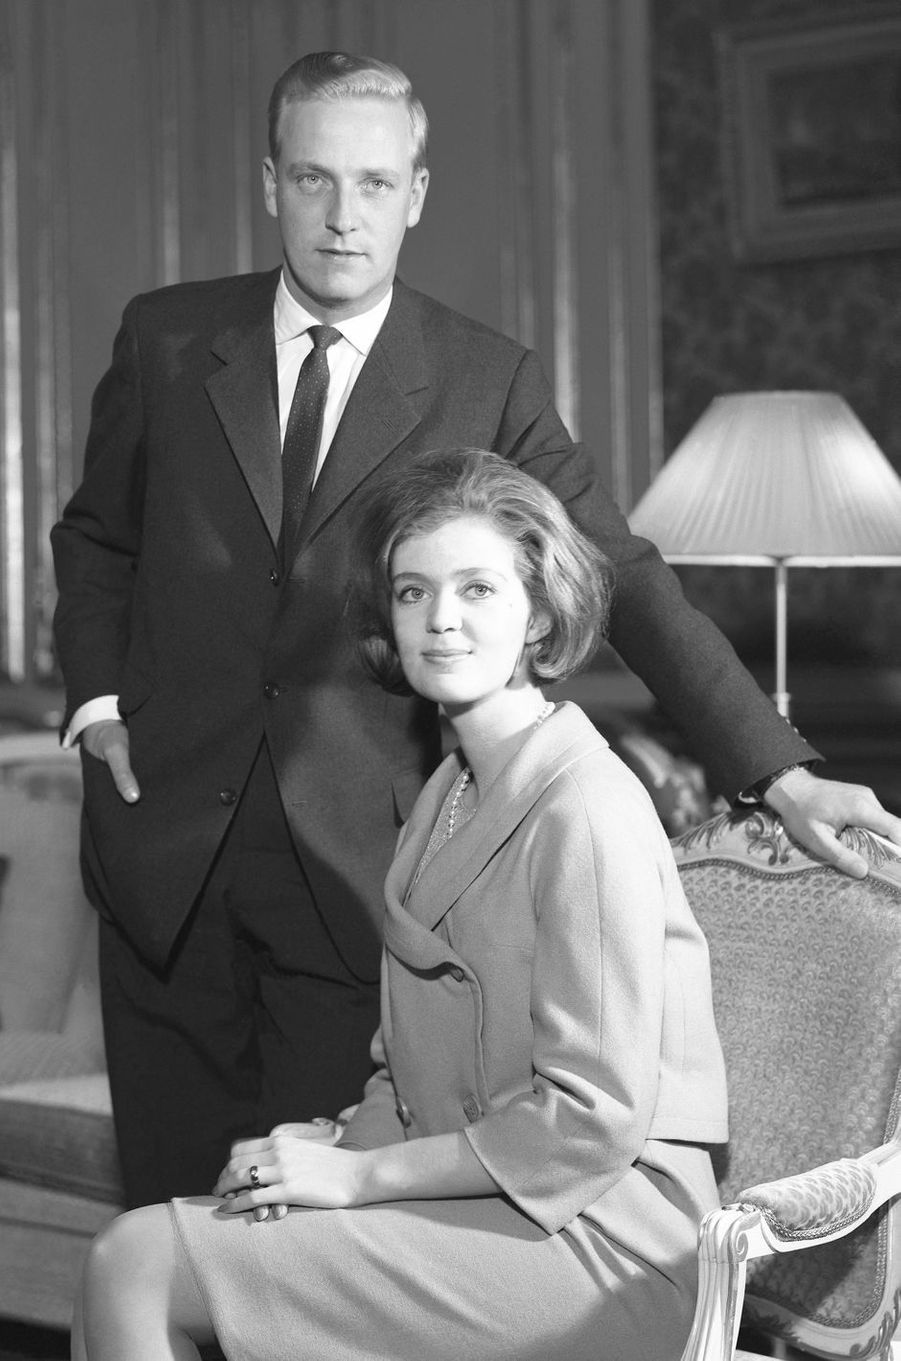 La princesse Birgitta de Suède avec son mari, en 1961